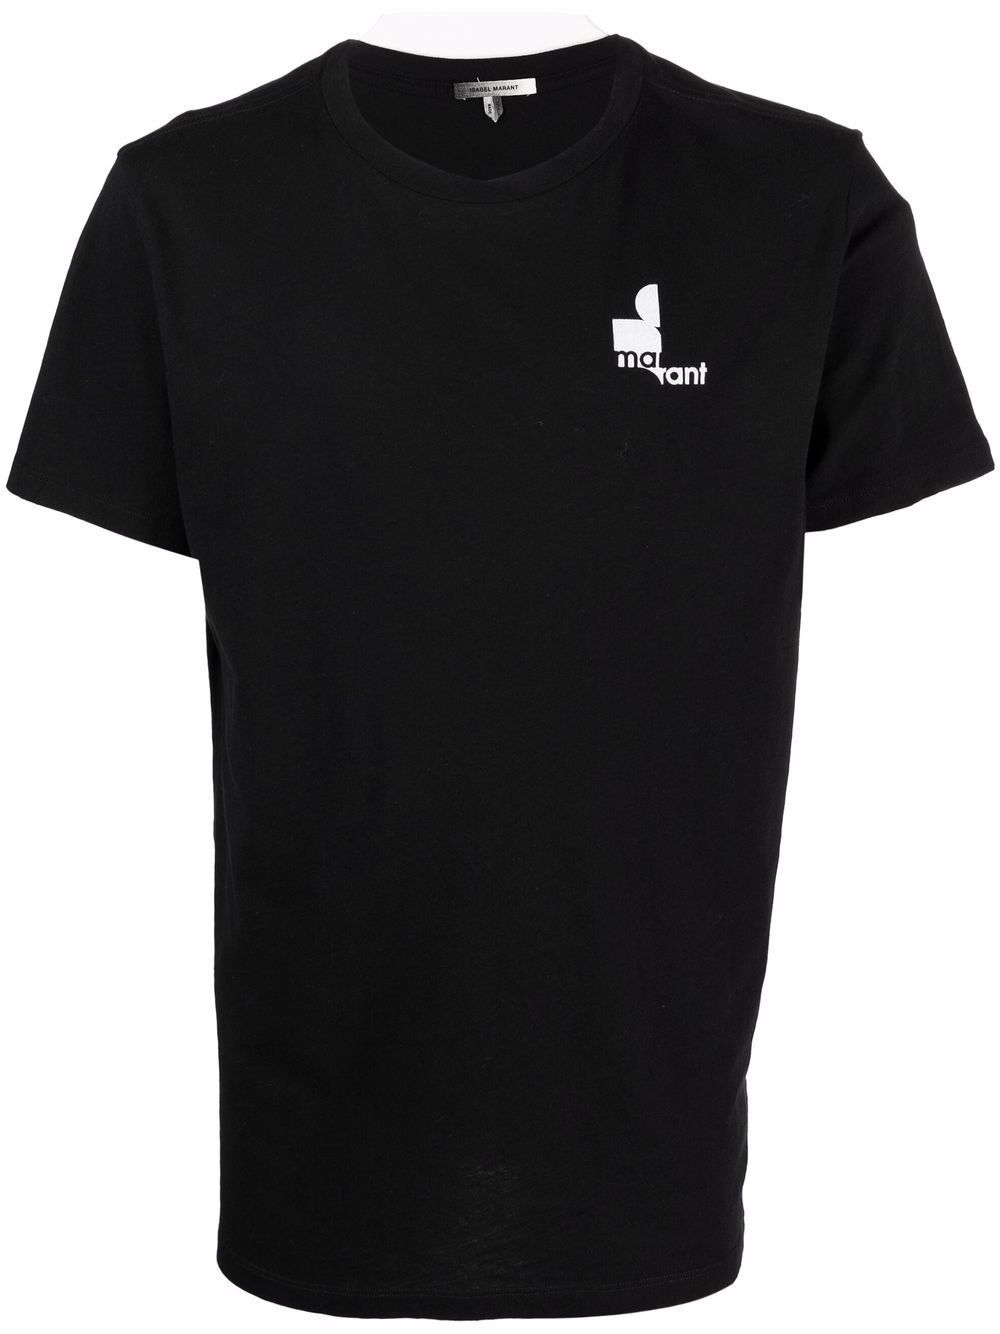 Isabel marant t-shirt e polo nero